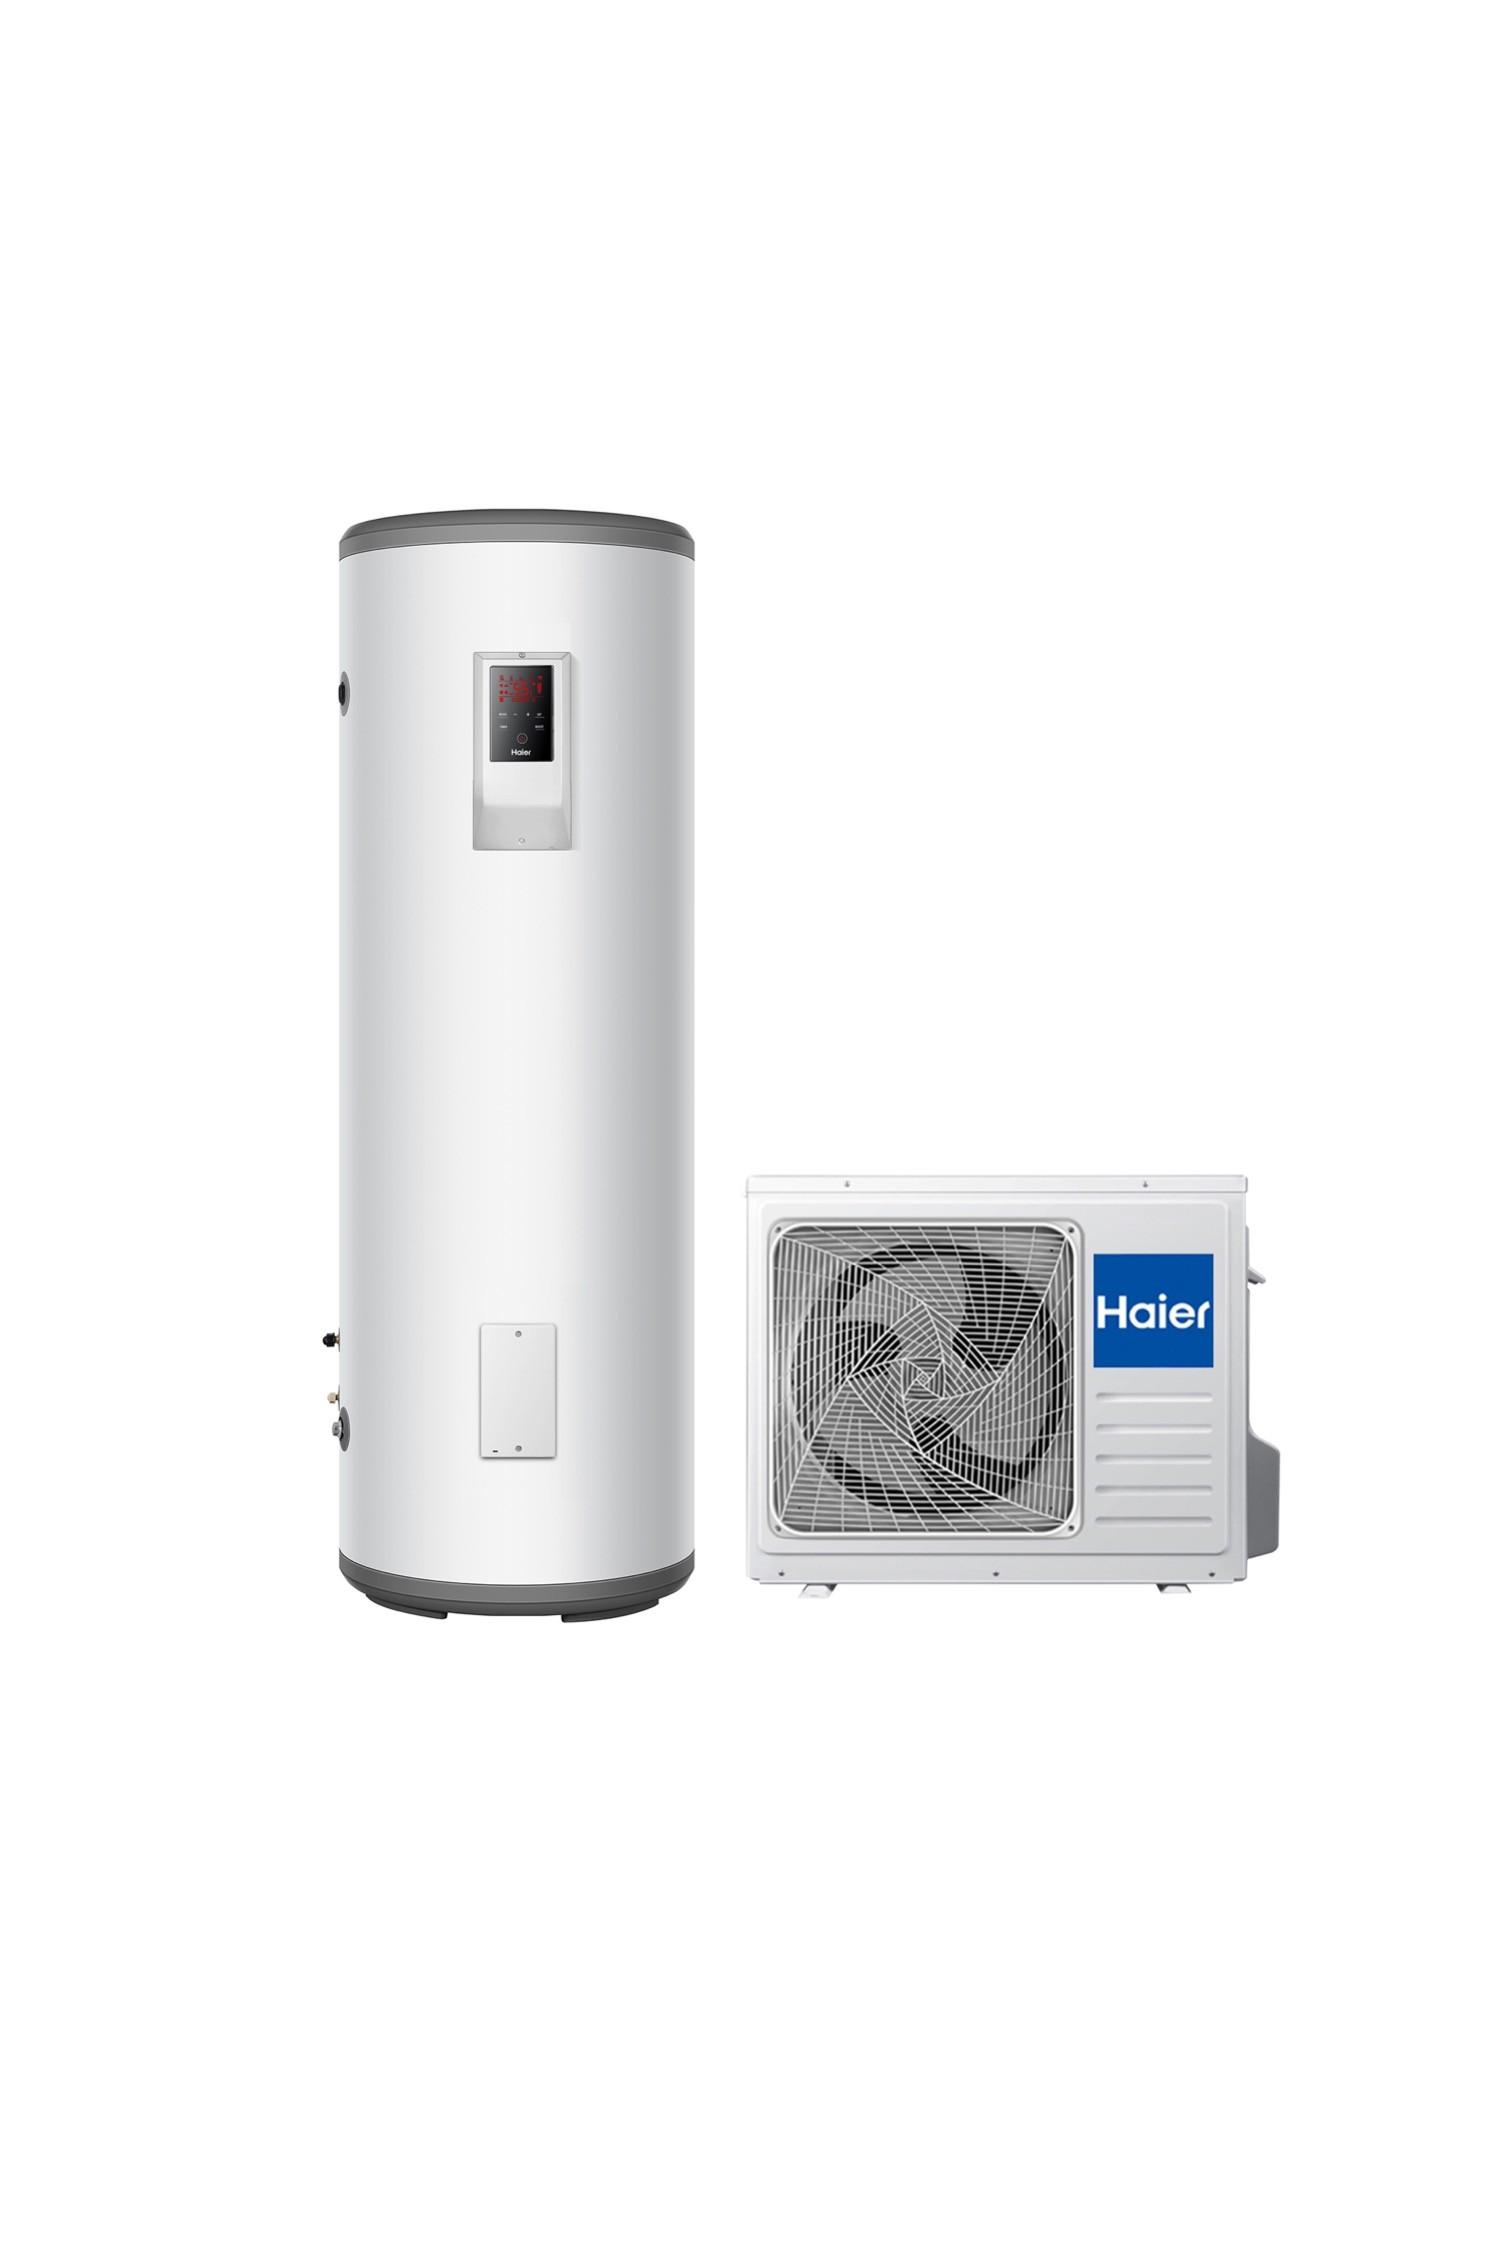 GREENoneTEC Haier Wärmepumpe HPWH S1 extern